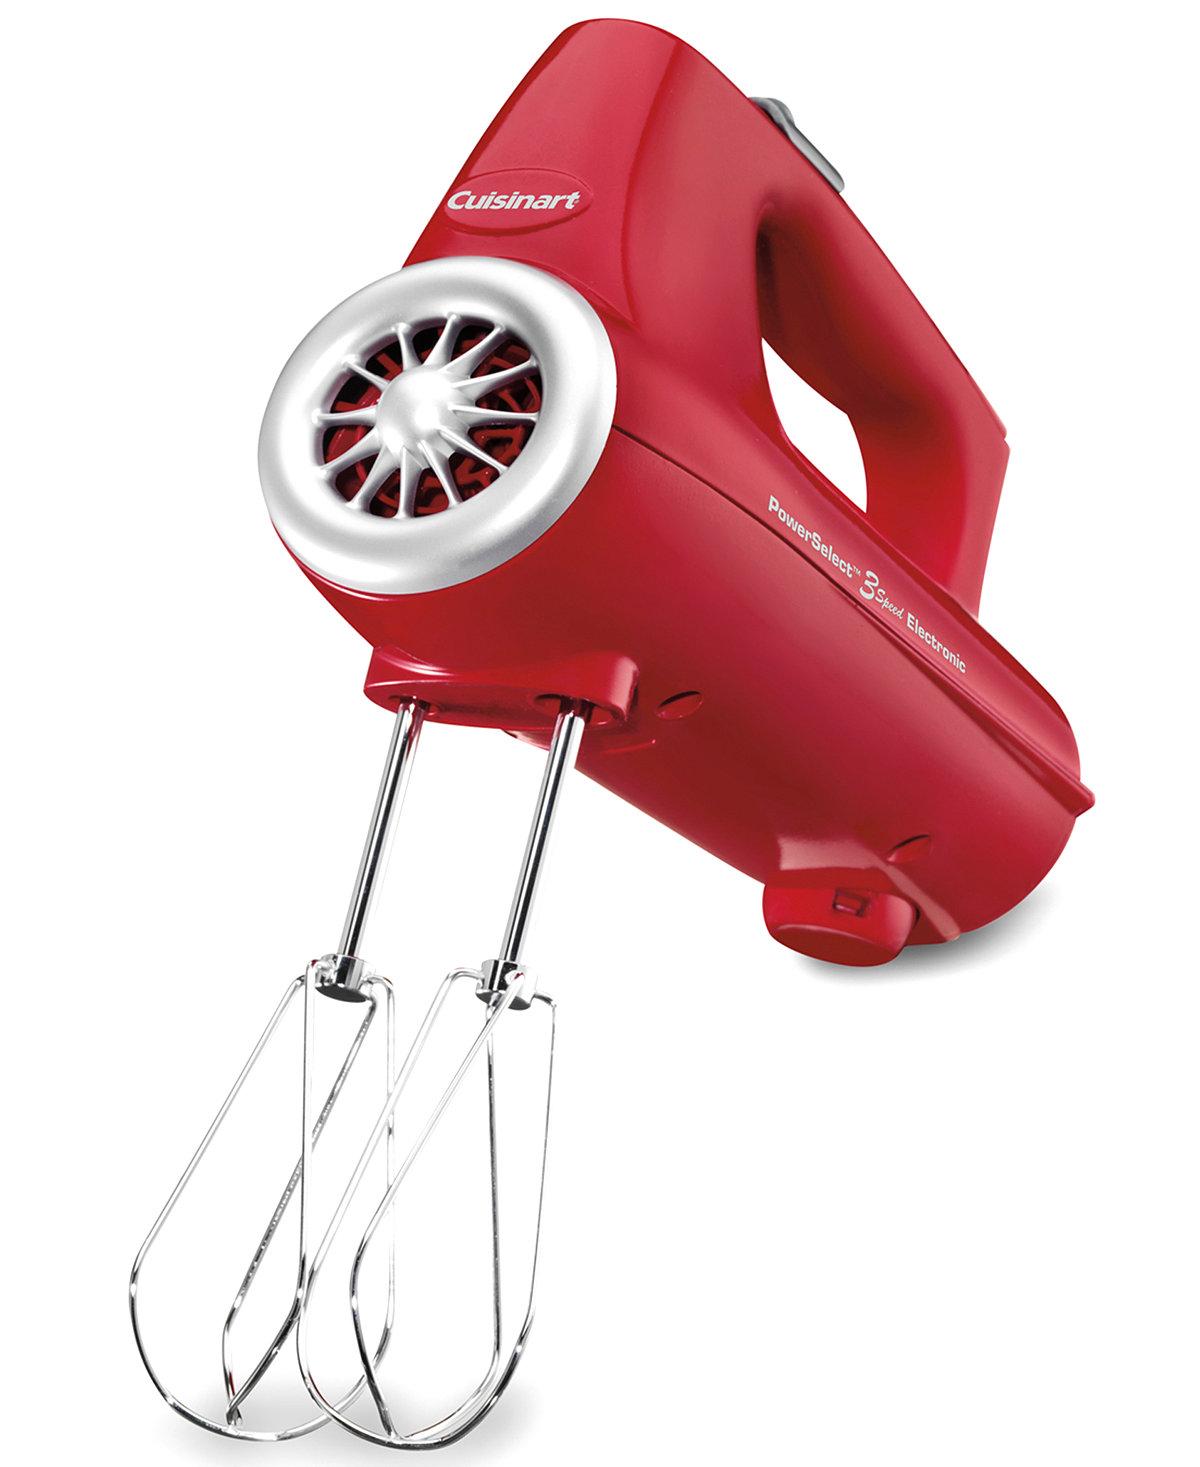 Cuisinart CHM-3 Hand Mixer, 3 Speed $17.99 + $10 Macys eGC + $5 Macy's Money